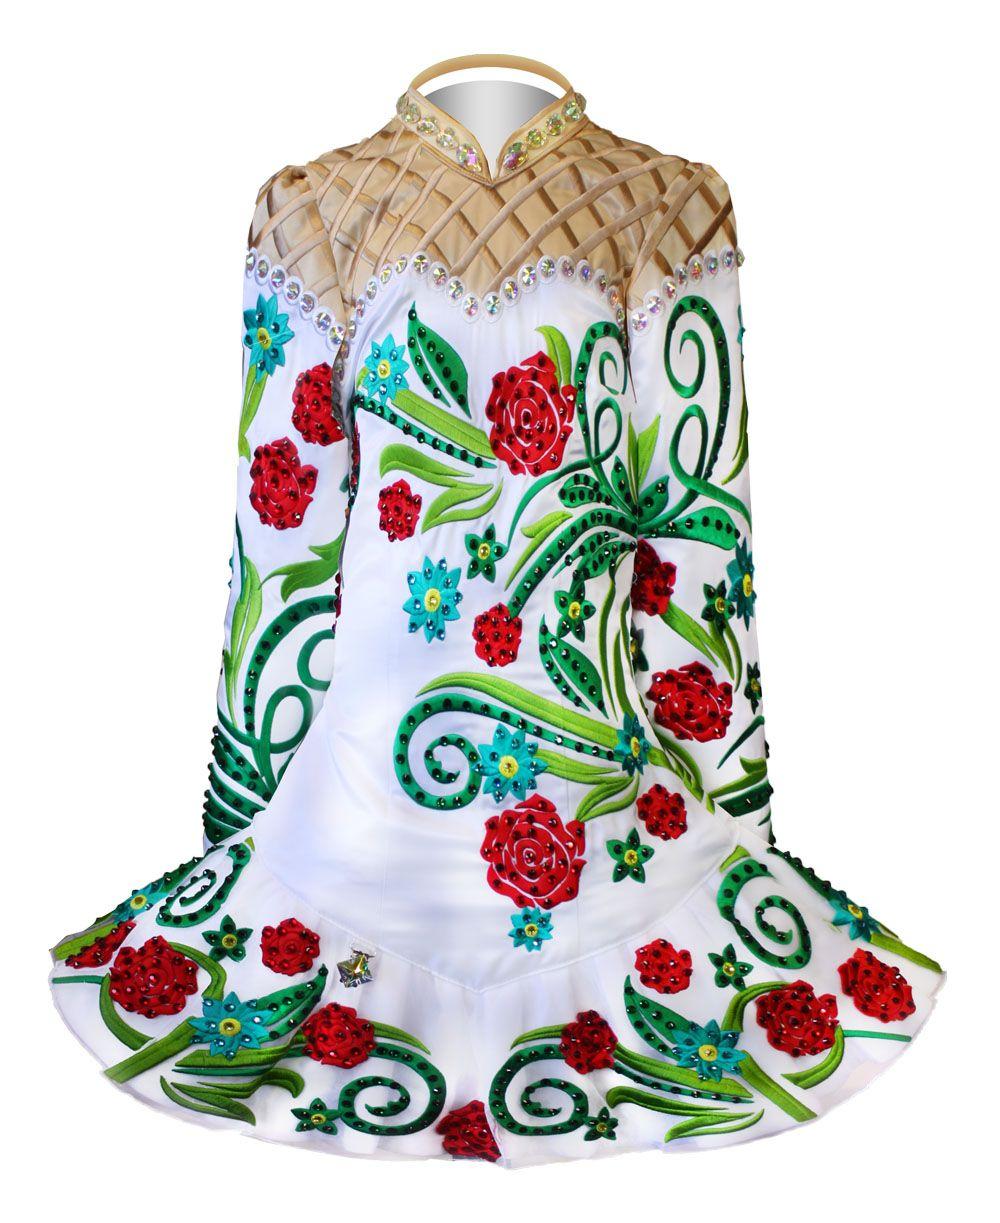 Elevation Design Irish dance dress.